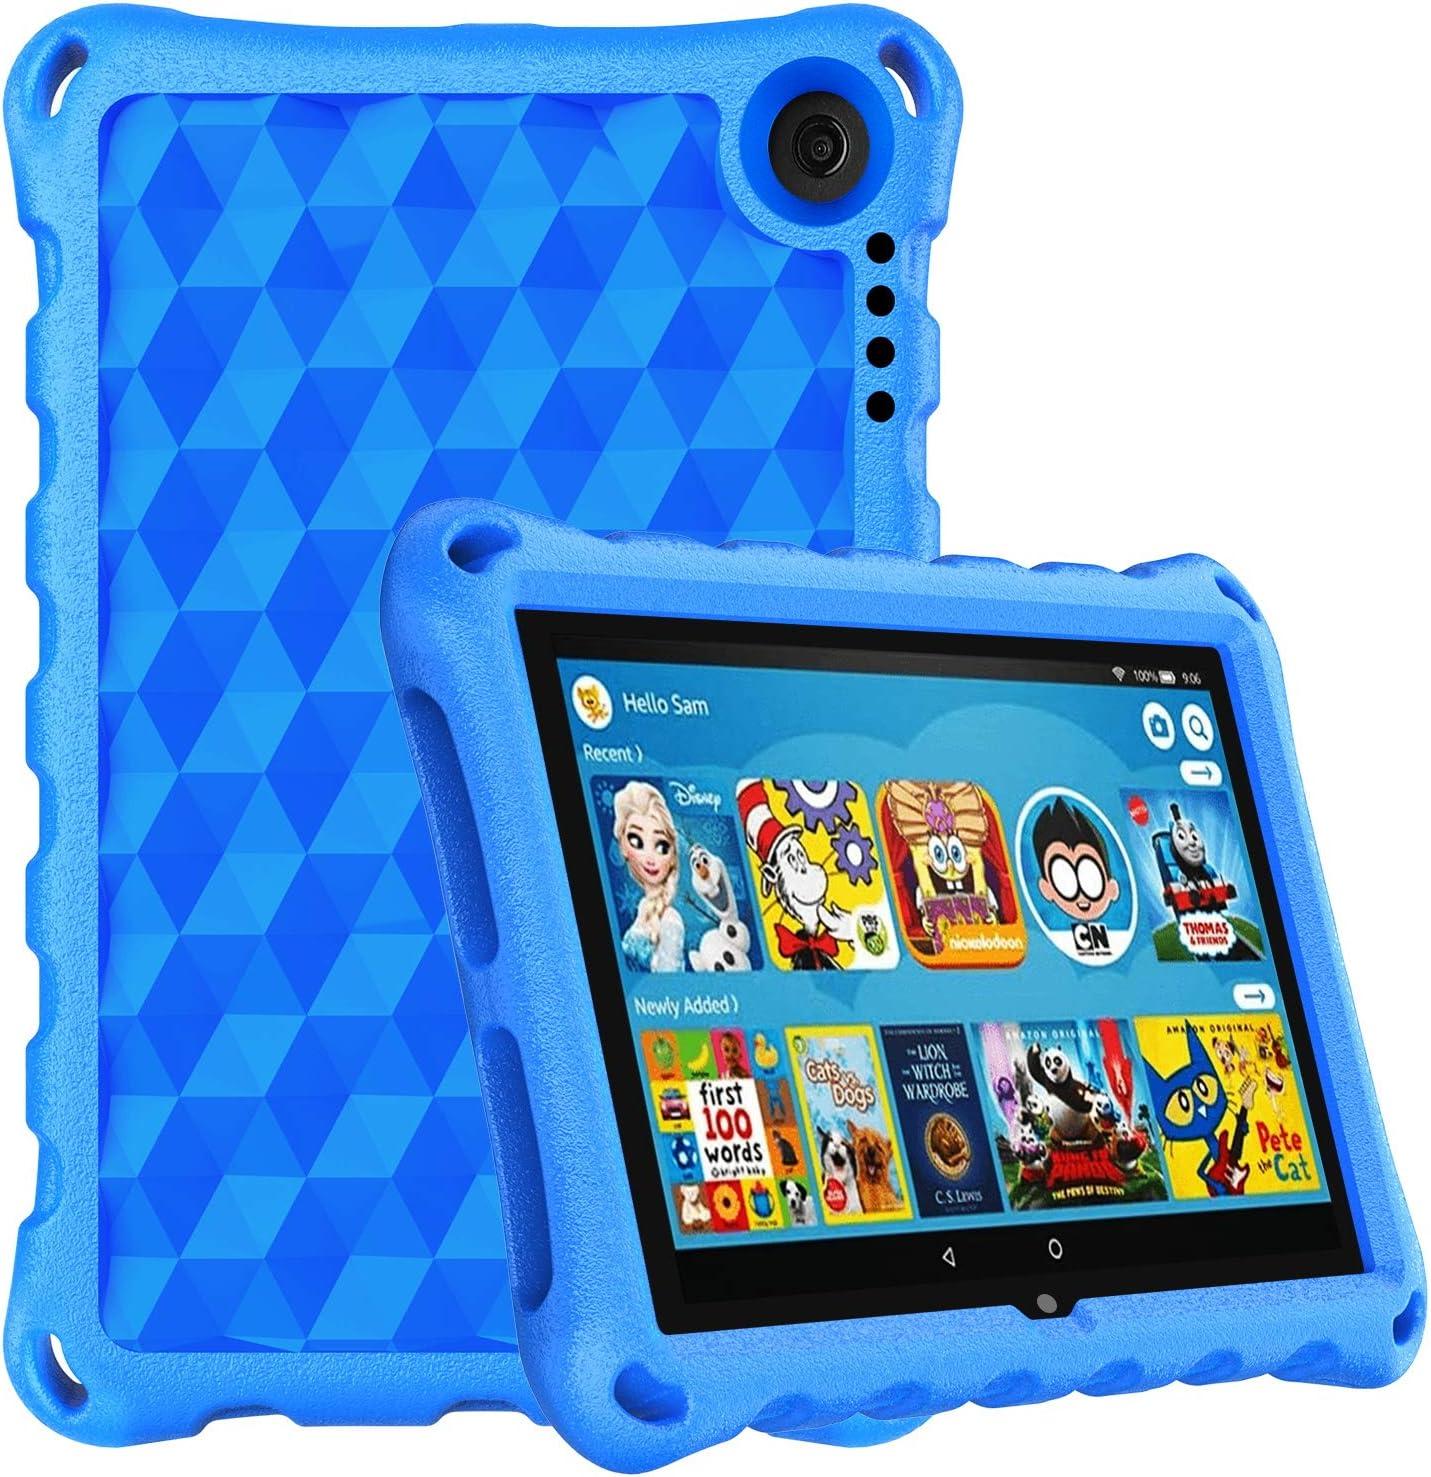 Amazon Com Fire Hd 8 2020 Case Fire Hd 8 Plus Tablet Case 10th Generation 2020 Release Dihines Lightweight Kids Proof Case For Amazon Kindle Fire Hd 8 Tablet Fire Hd 8 Plus Blue Computers Accessories